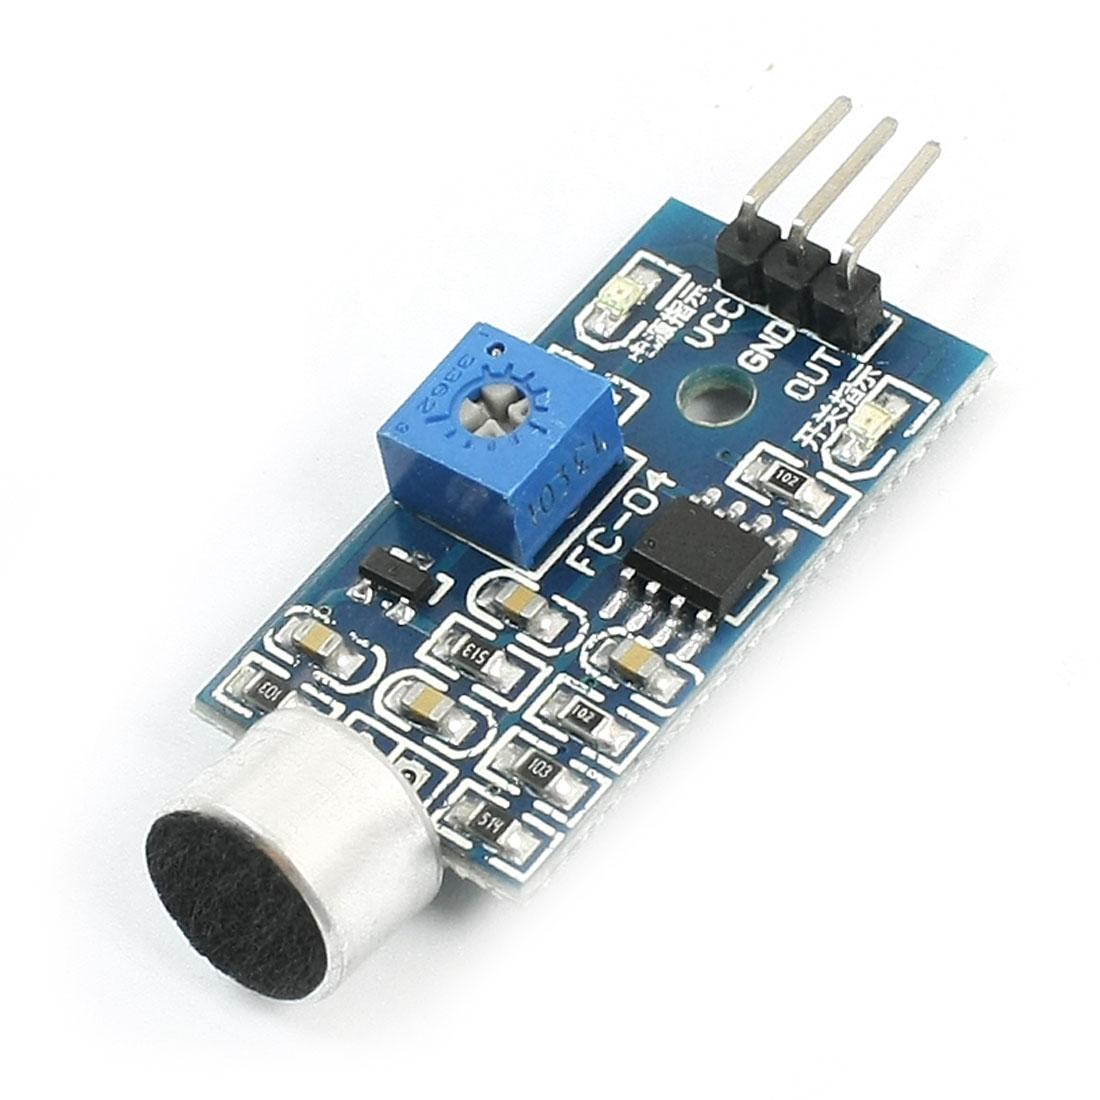 Microcontroller DIY Electronic Microphone Sound Sensor Module DC 5V